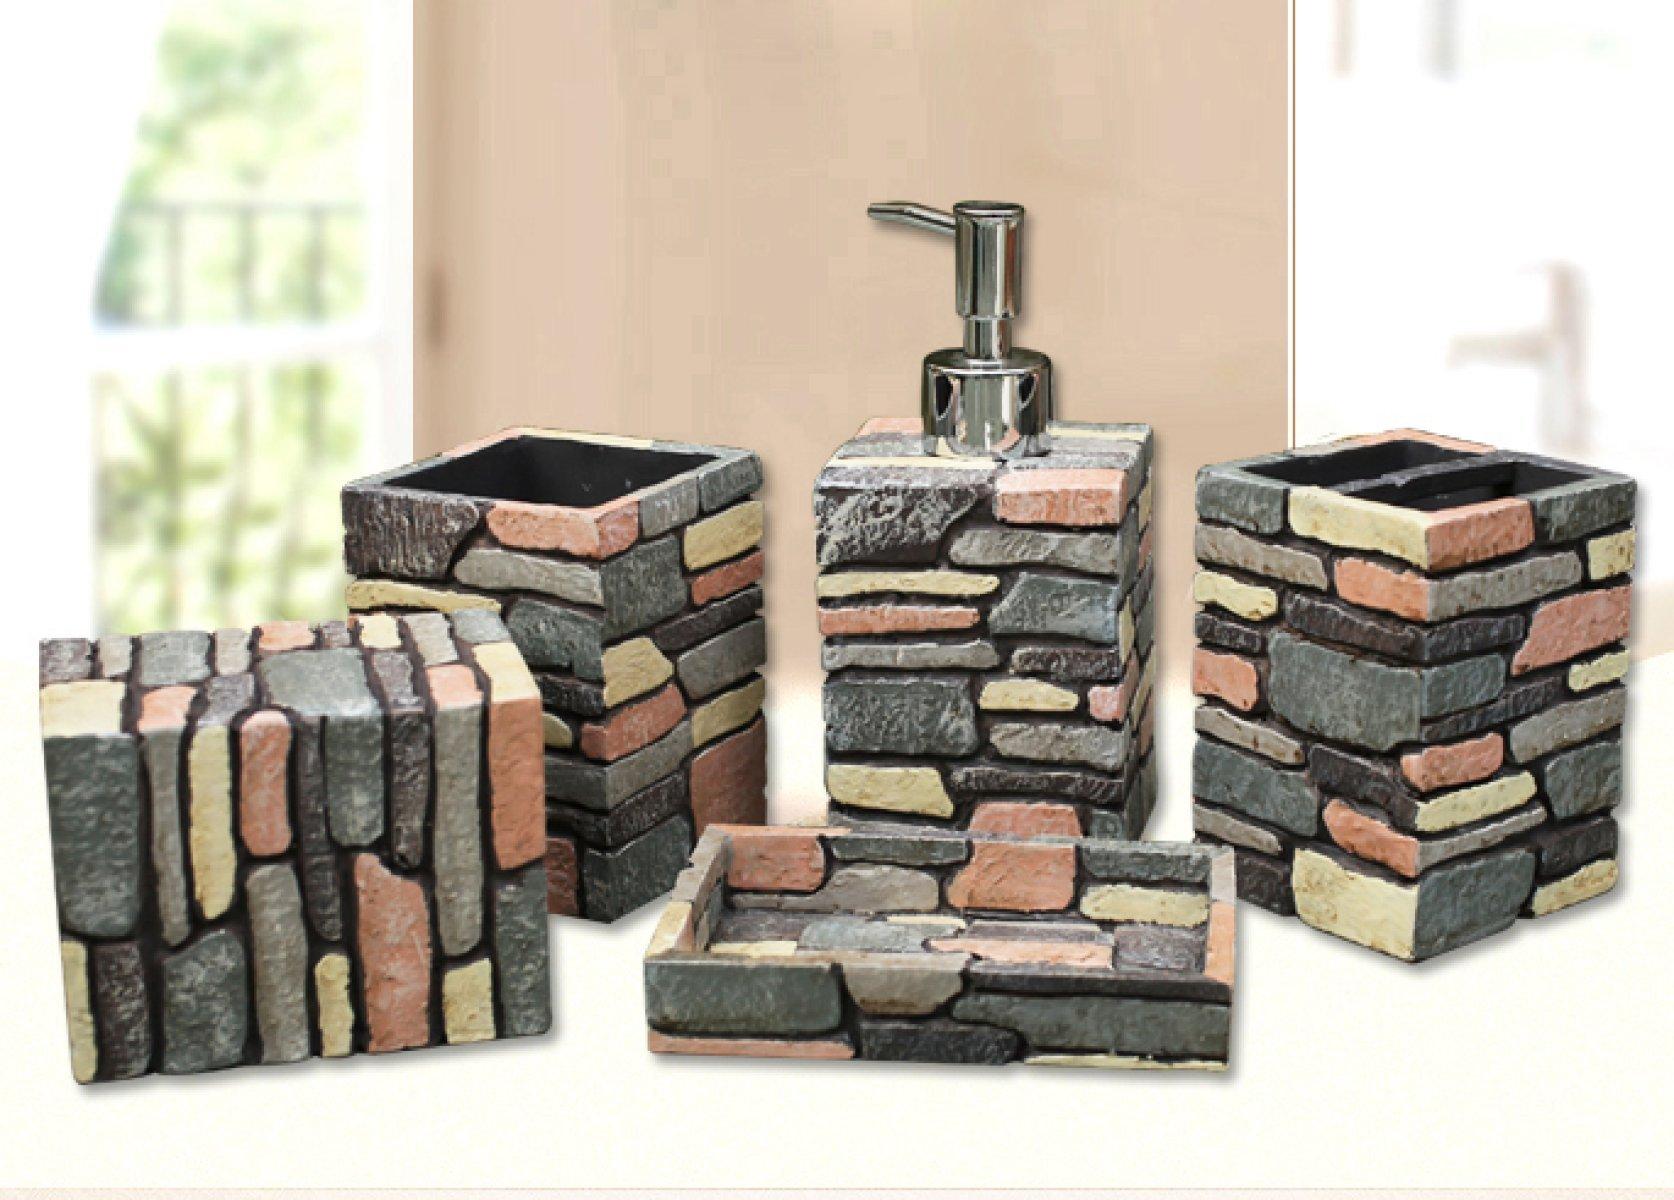 LZSJ Bathroom Gargle Cup Set 5 Piece Bathroom Accessories Set Nostalgic American Country Resin Toilet Gift